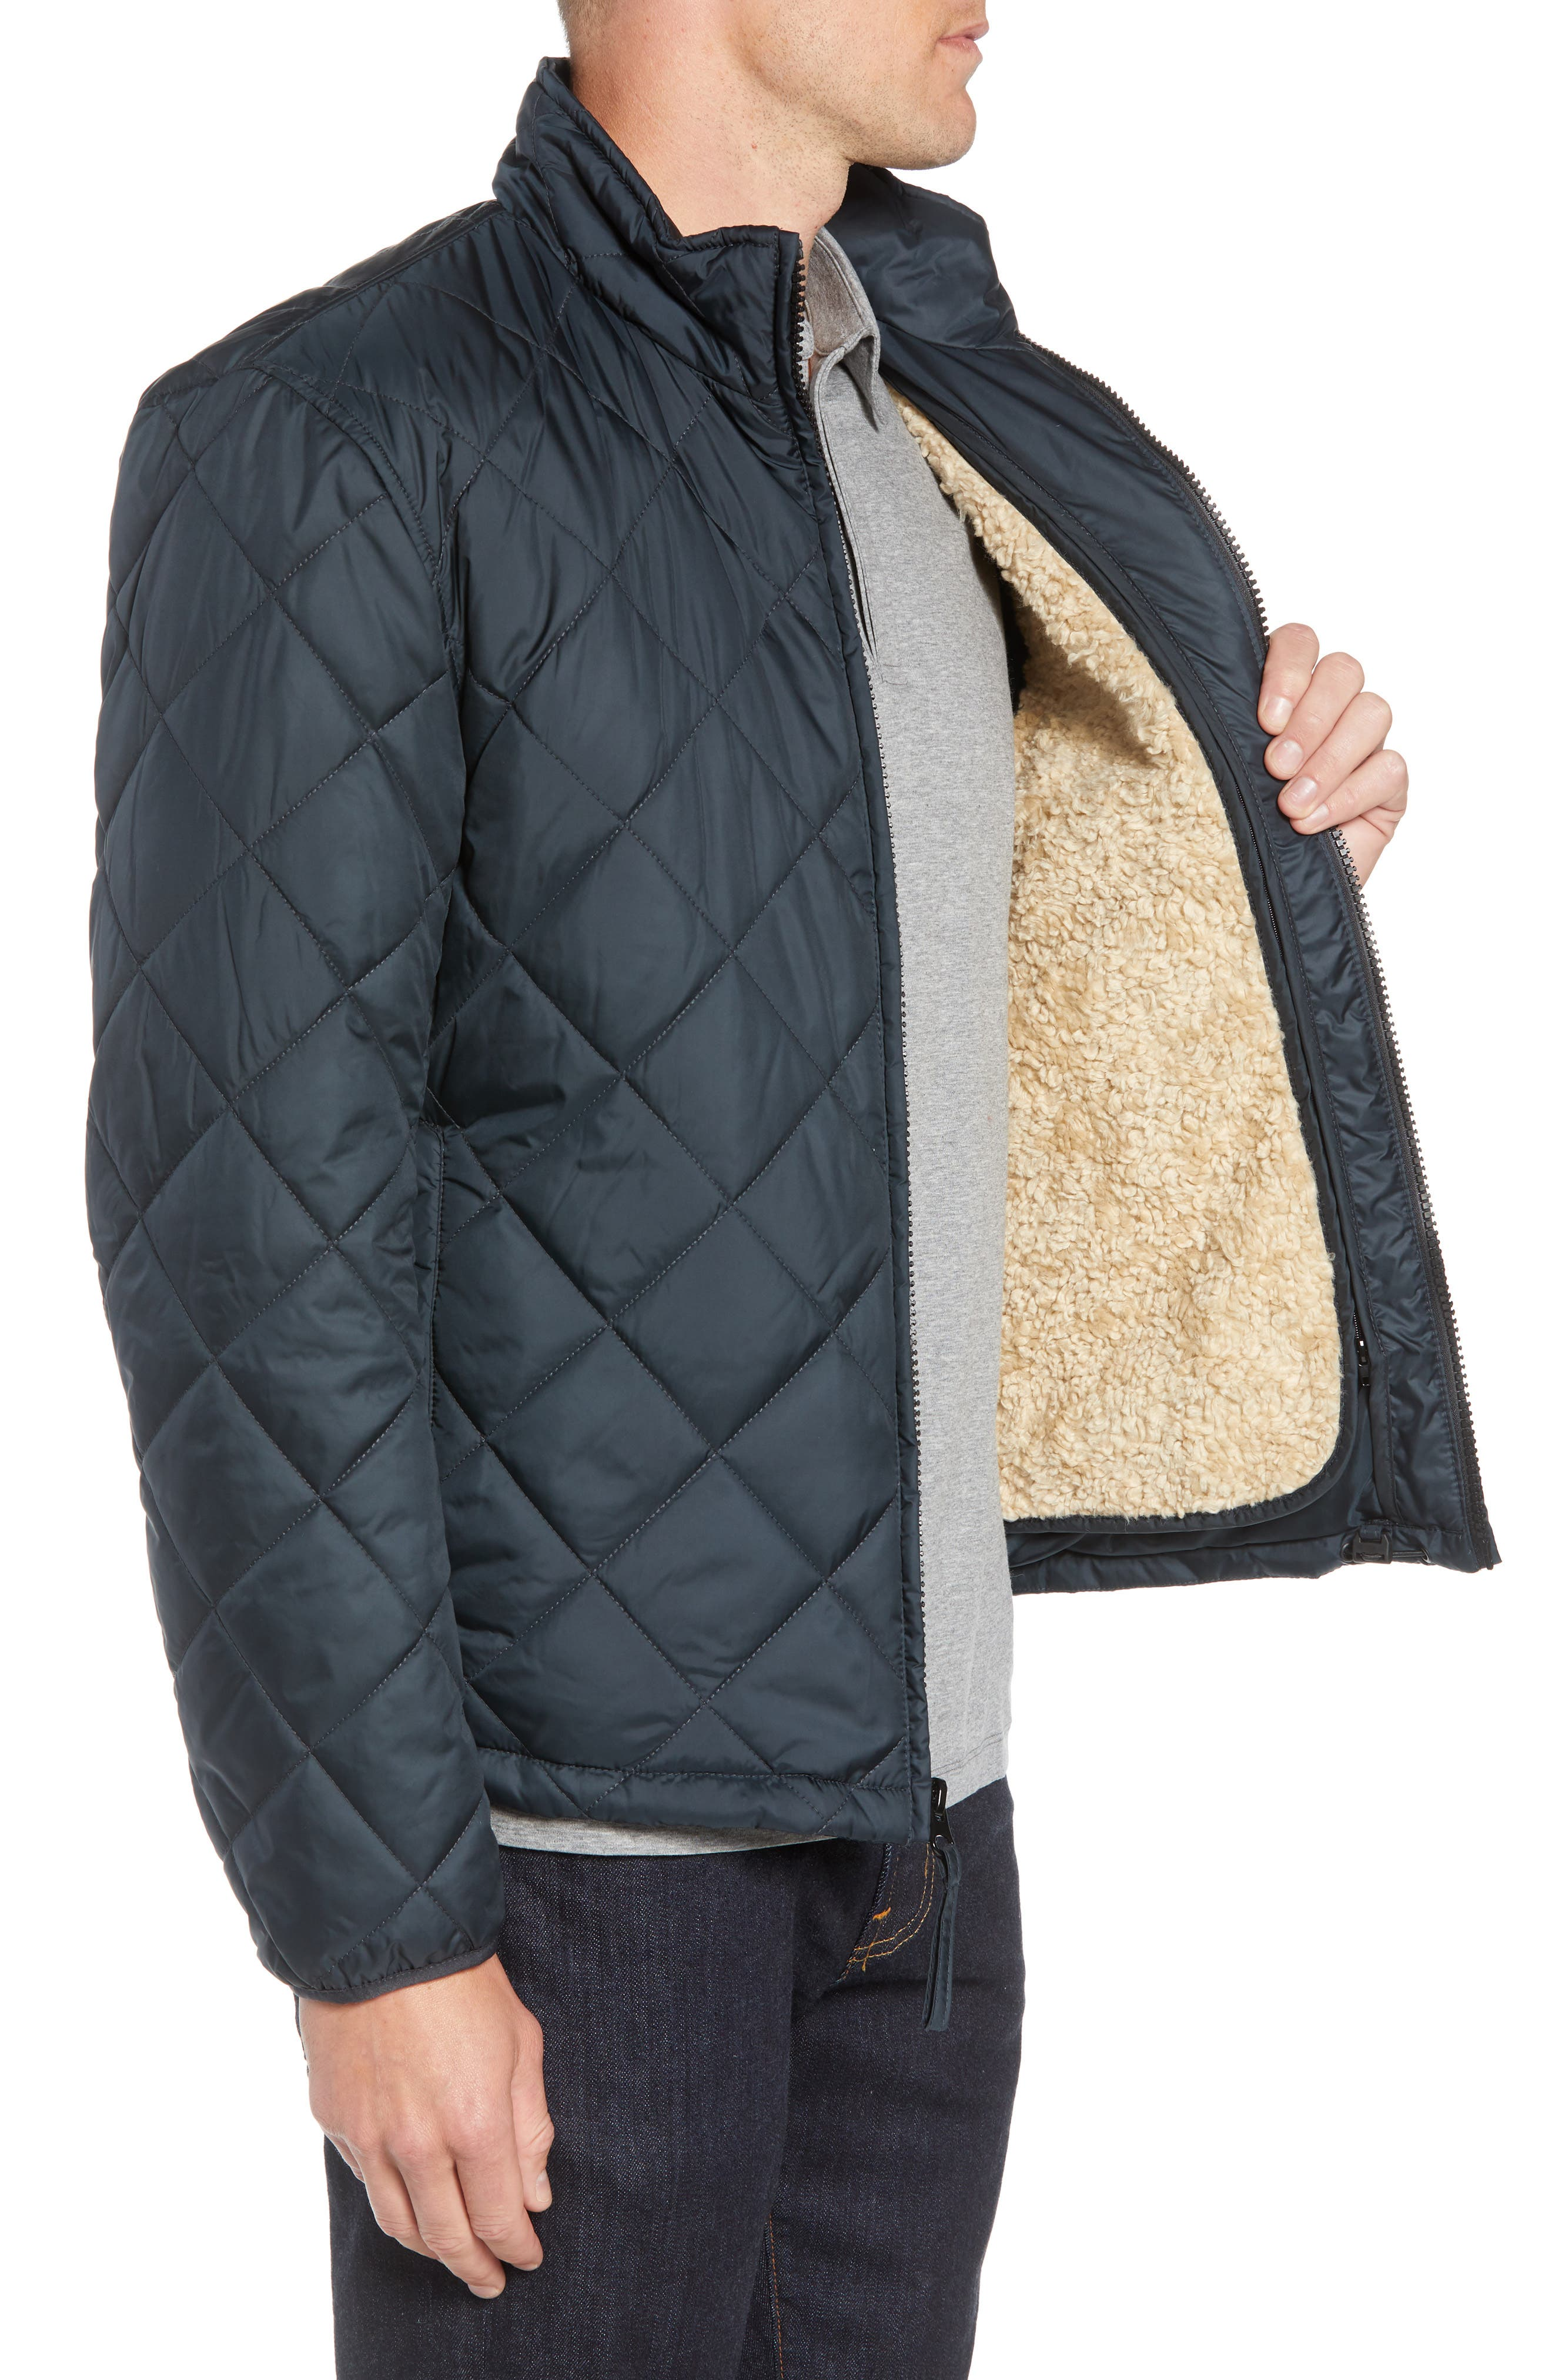 MARC NEW YORK, Humboldt Quilted Jacket, Alternate thumbnail 4, color, BLACK